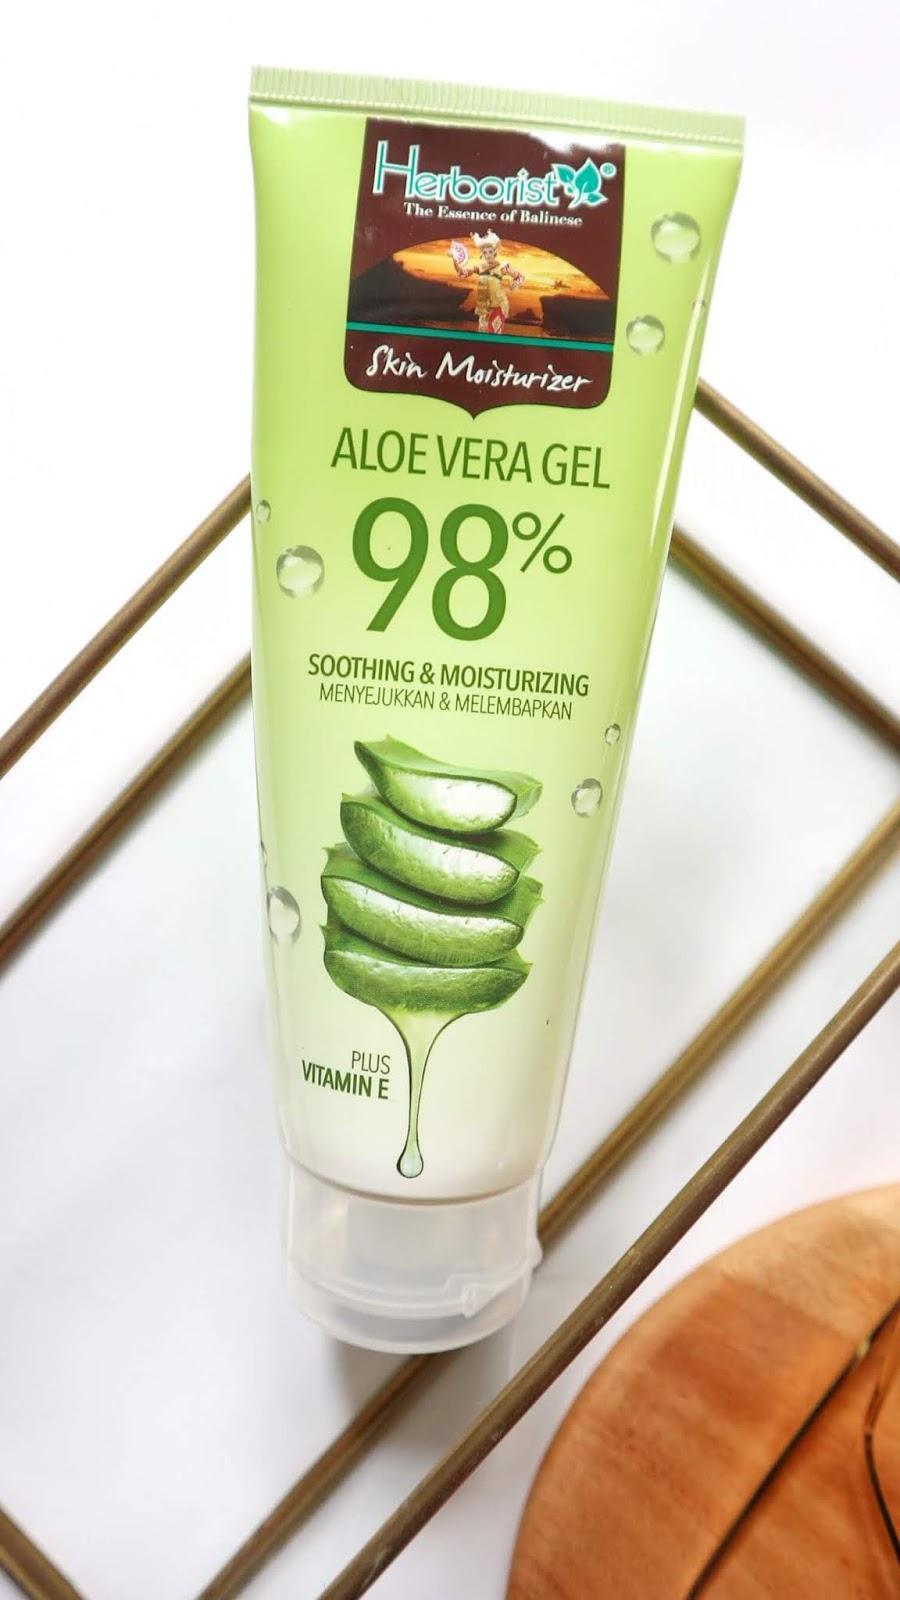 Herborist 98% Aloe Vera Gel